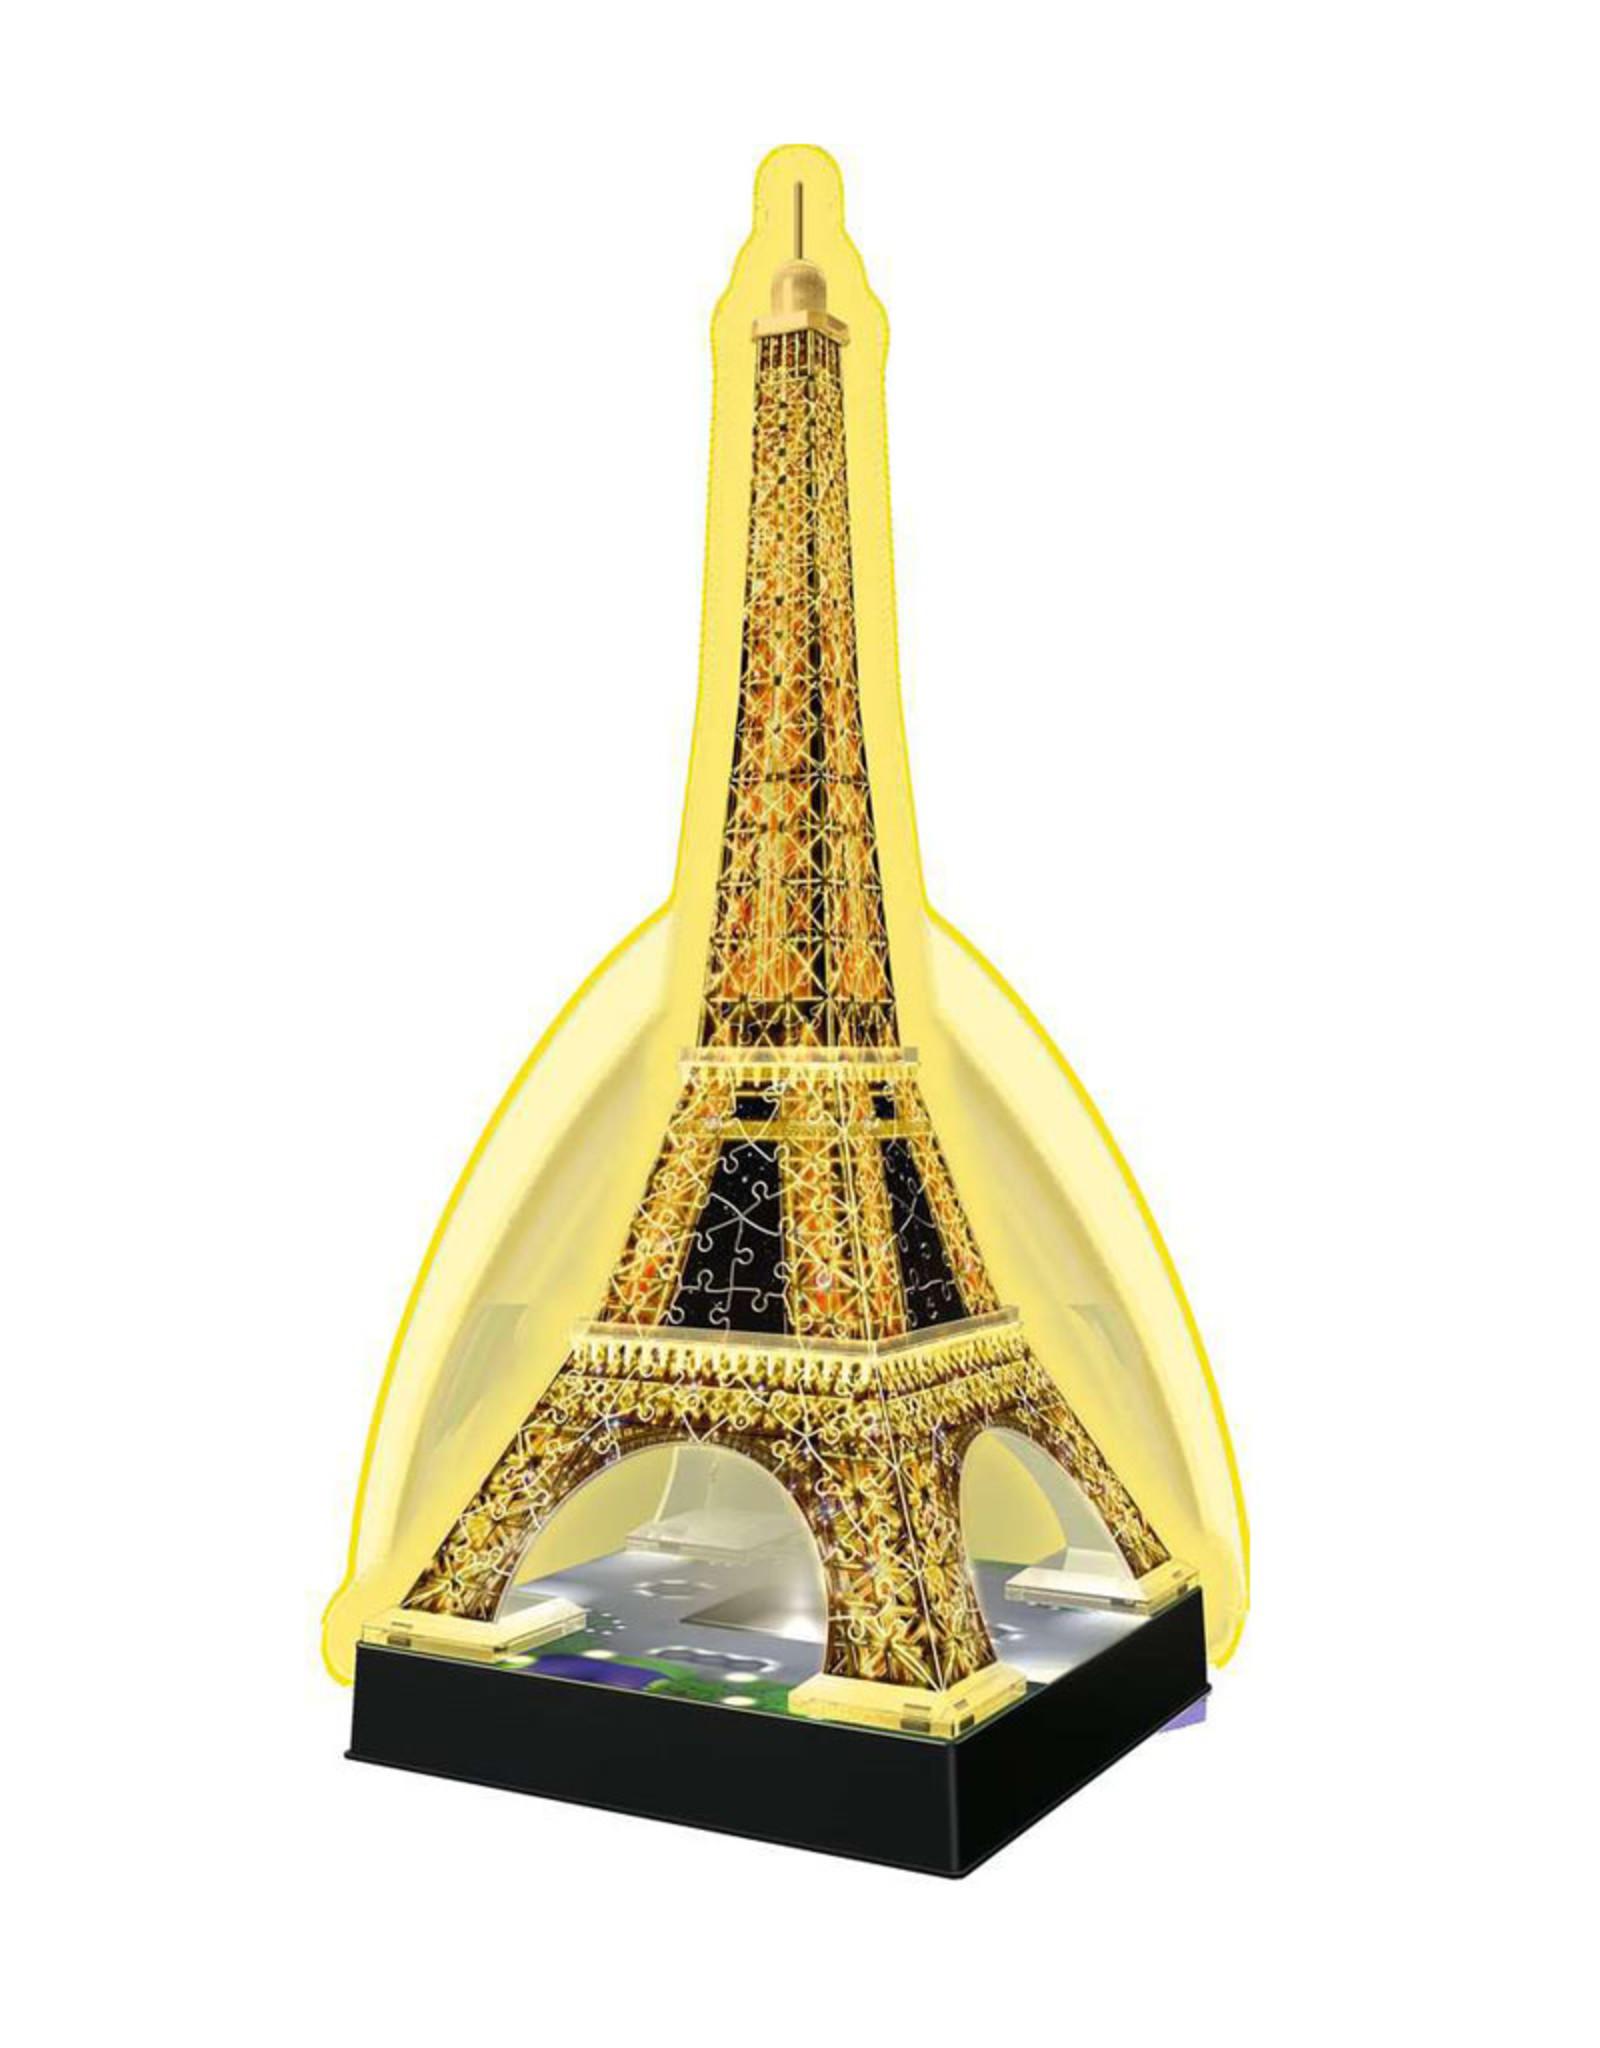 Ravensburger Eiffel Tower by Night  3D Puzzle 216 PCS